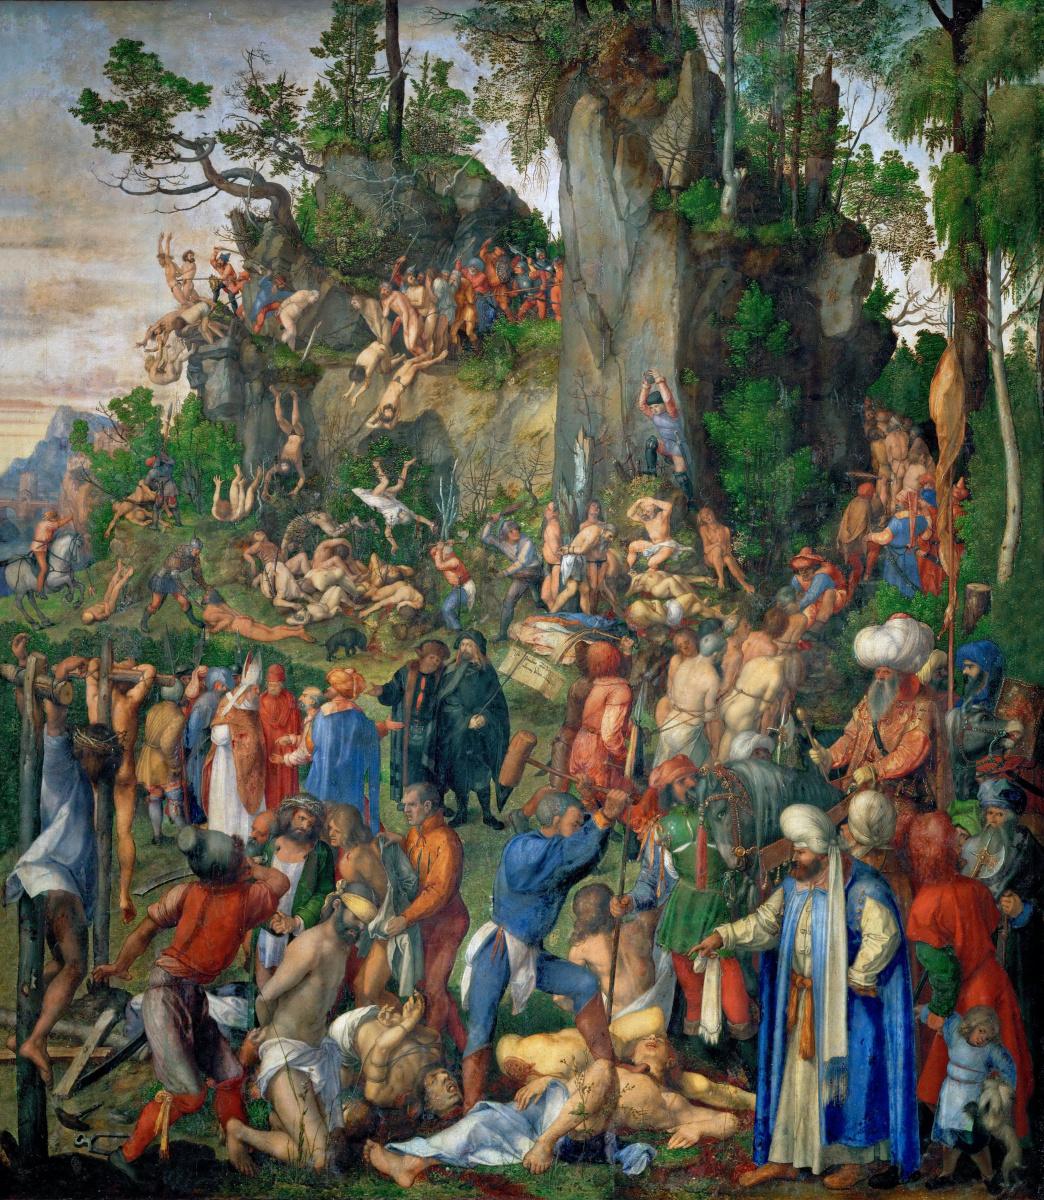 Albrecht Durer. Martyrdom of the Ten Thousand